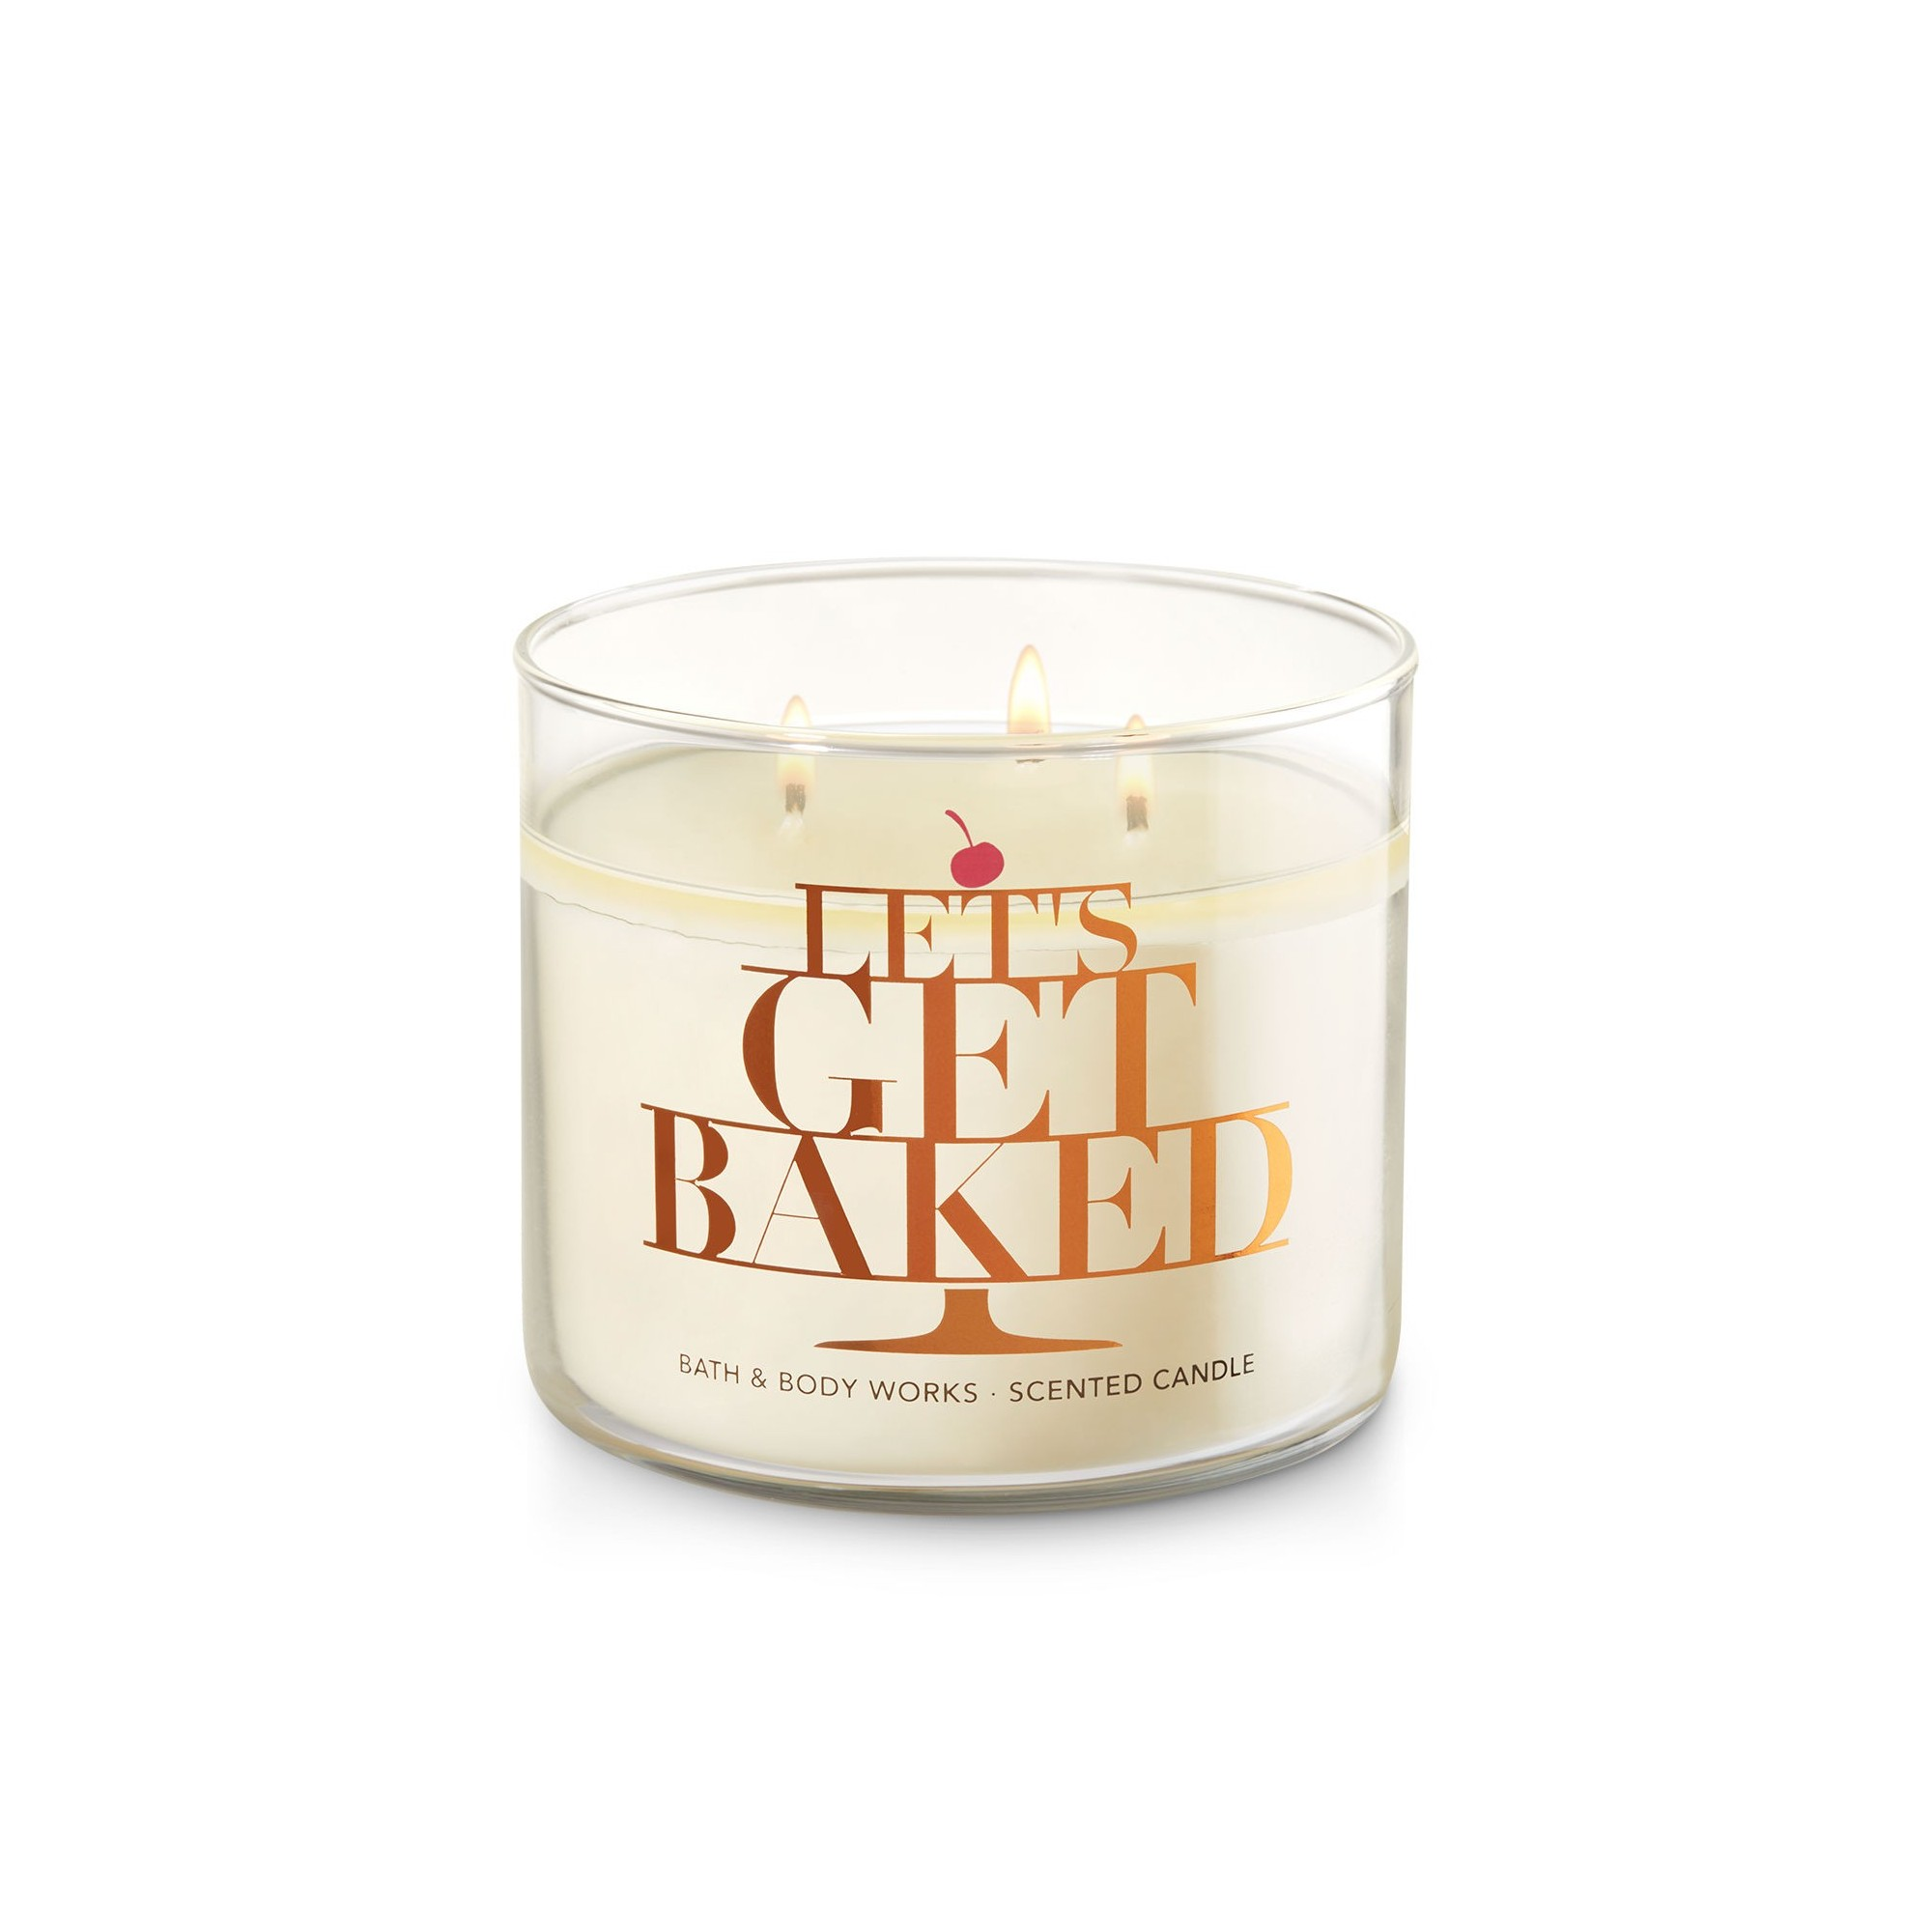 Bath & Body Works Creamy Nutmeg 3 Wick Scented Candle